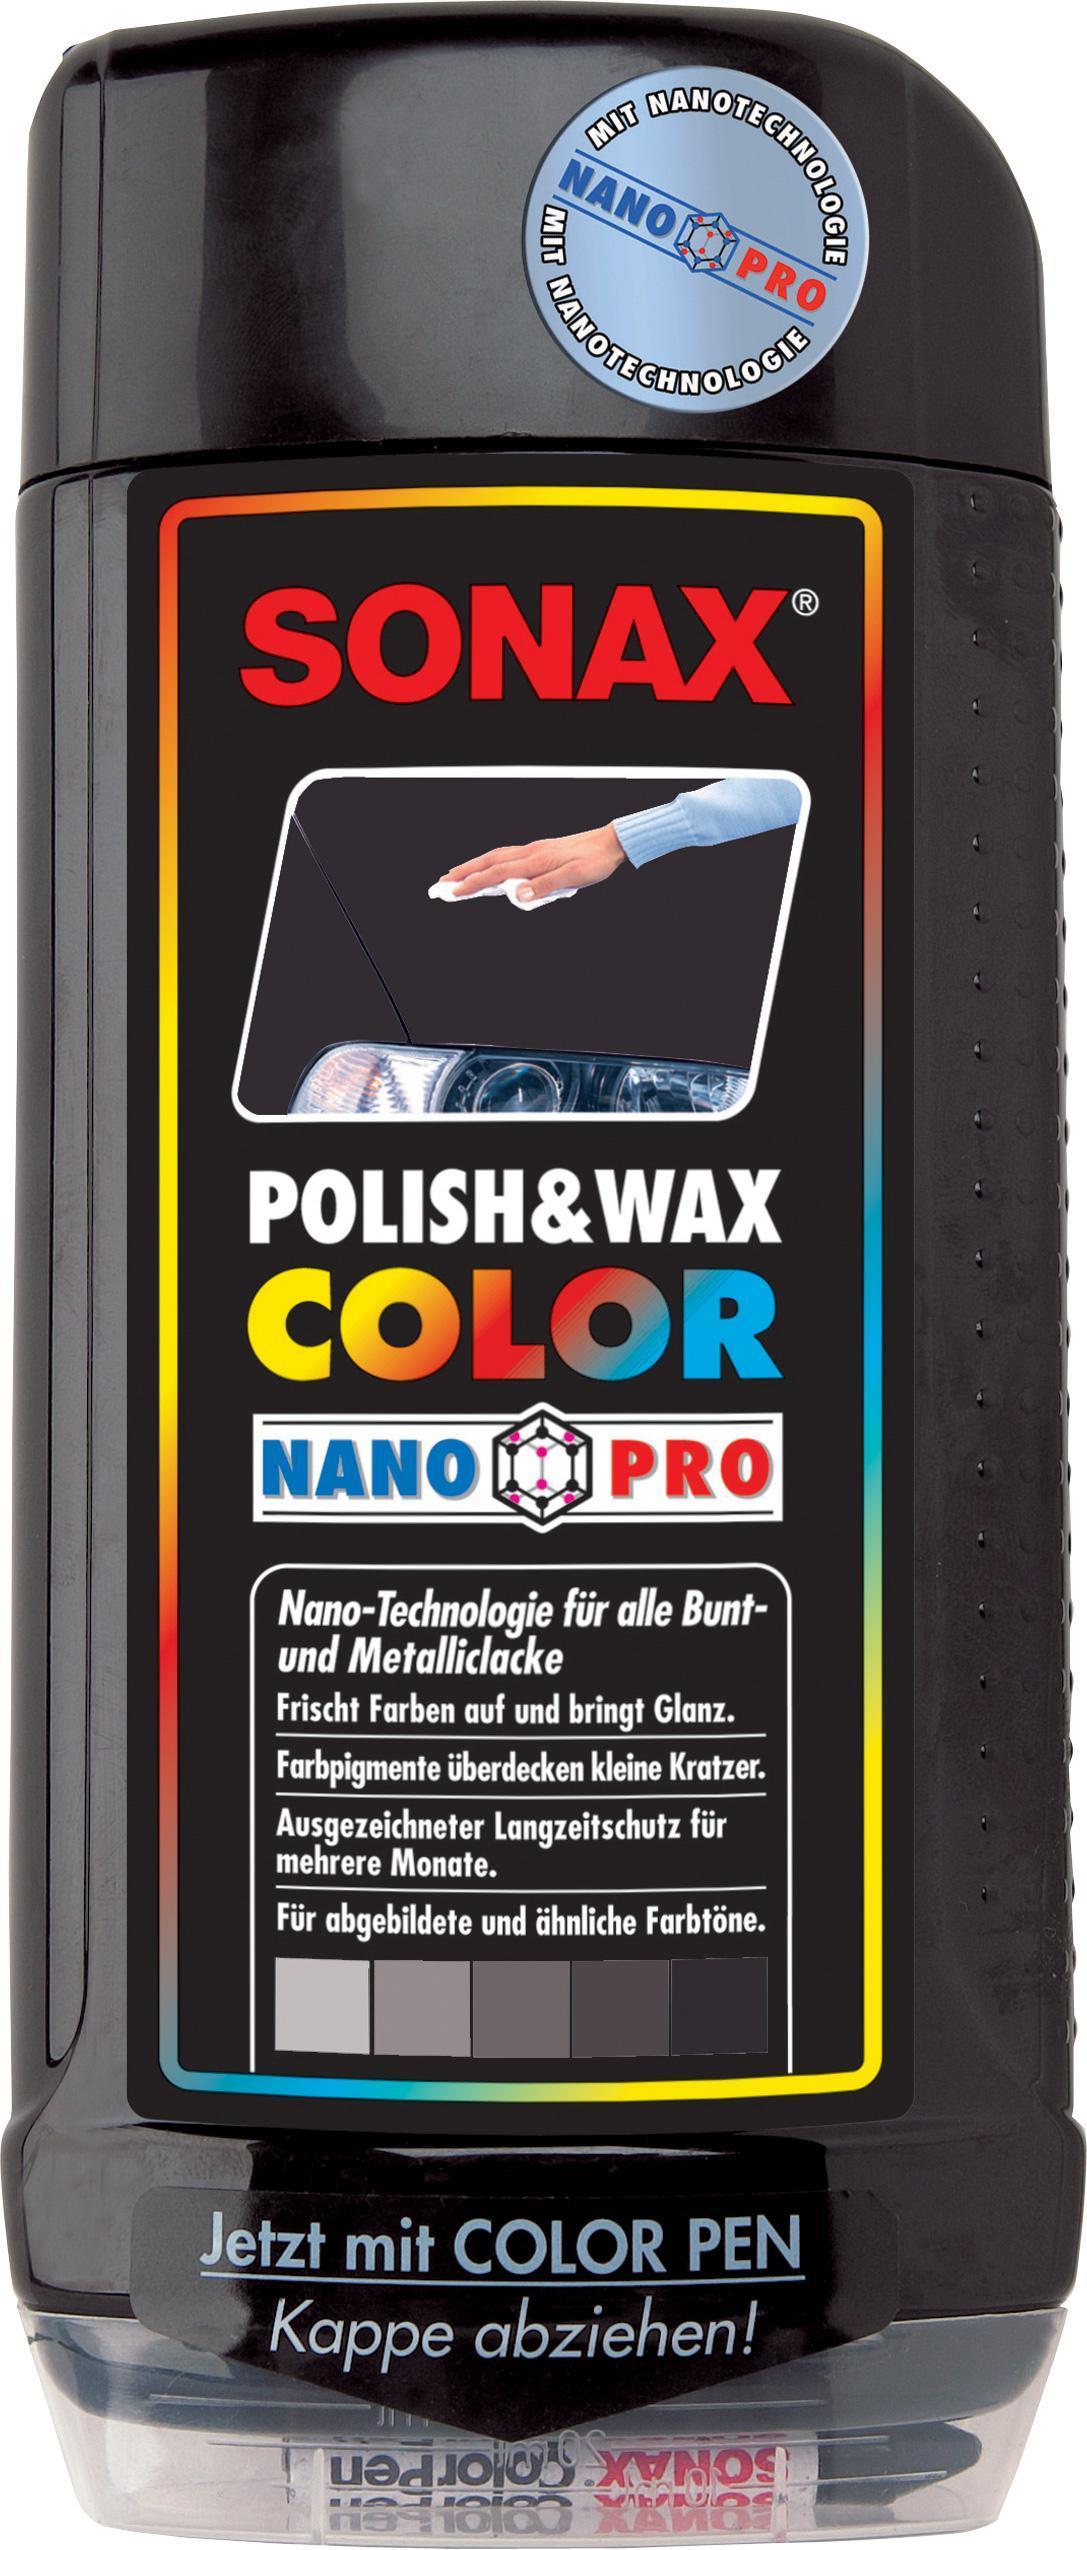 sonax polish wax color nano pro schwarz 500ml autoteile walter schork gmbh. Black Bedroom Furniture Sets. Home Design Ideas